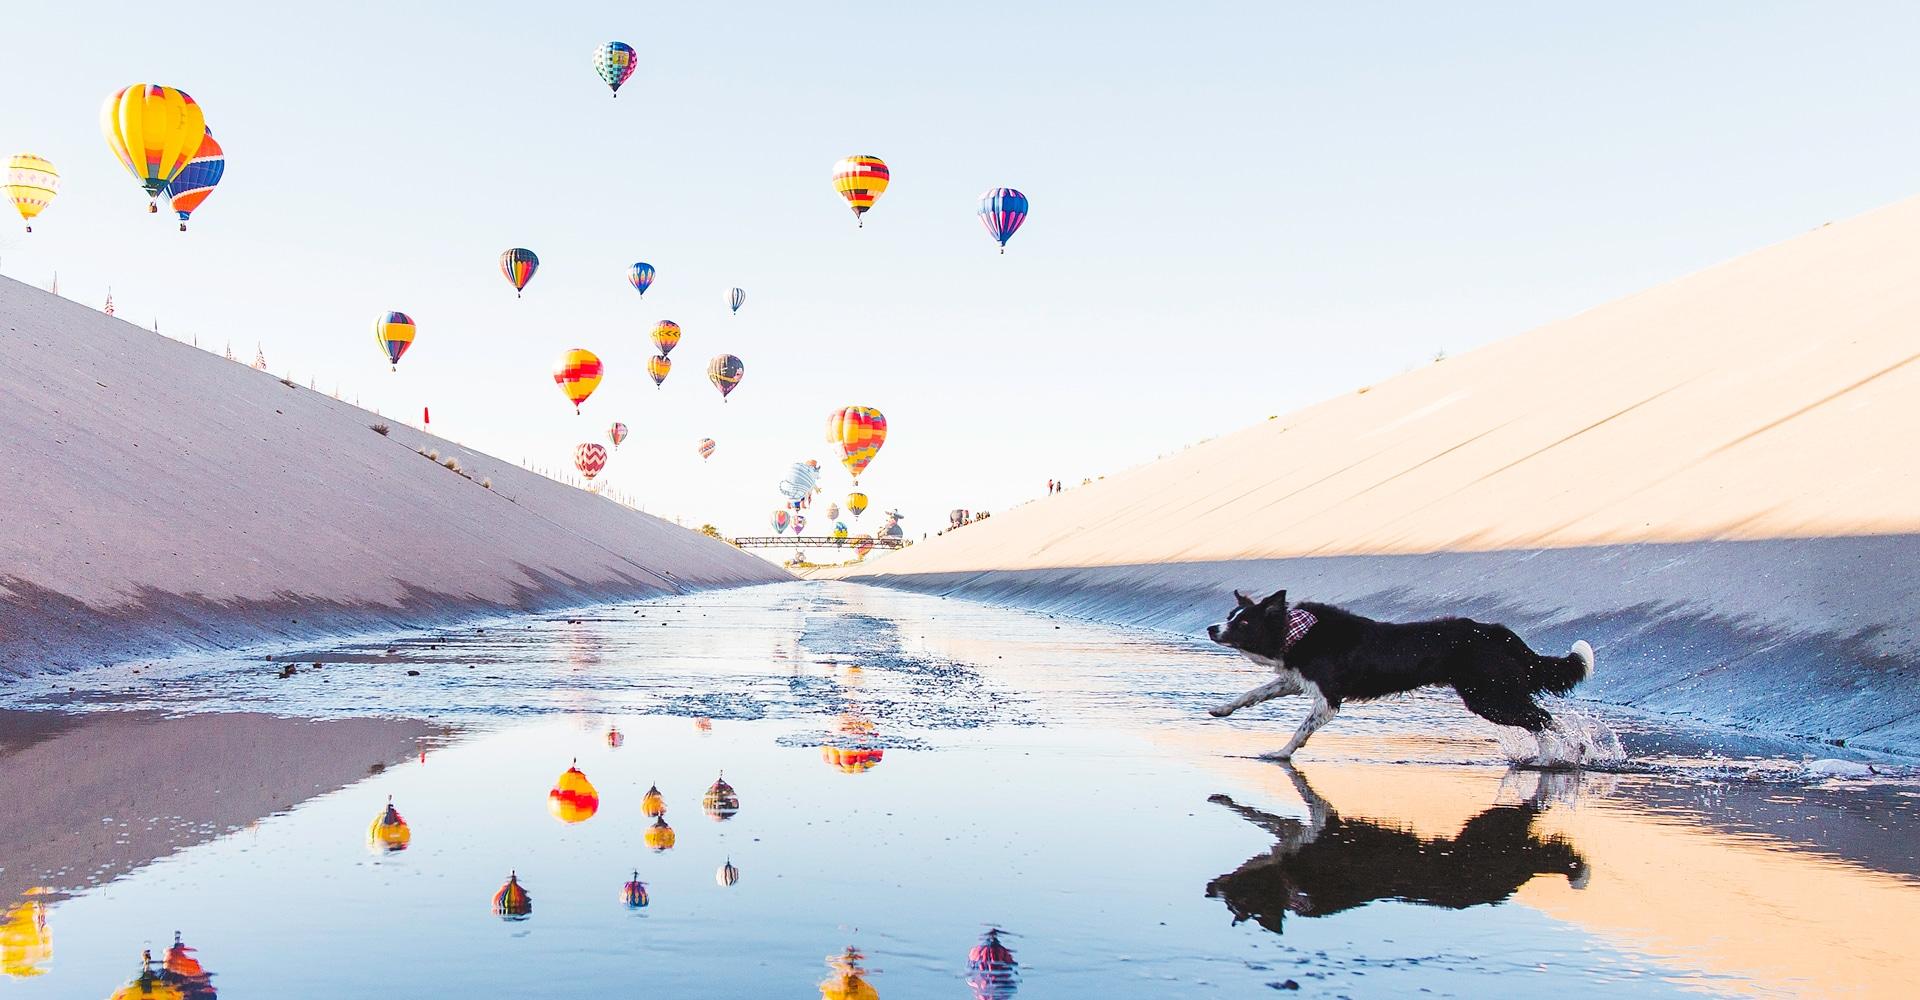 Have Dog, Will Travel – Andrew Knapp & Jordan Kahana